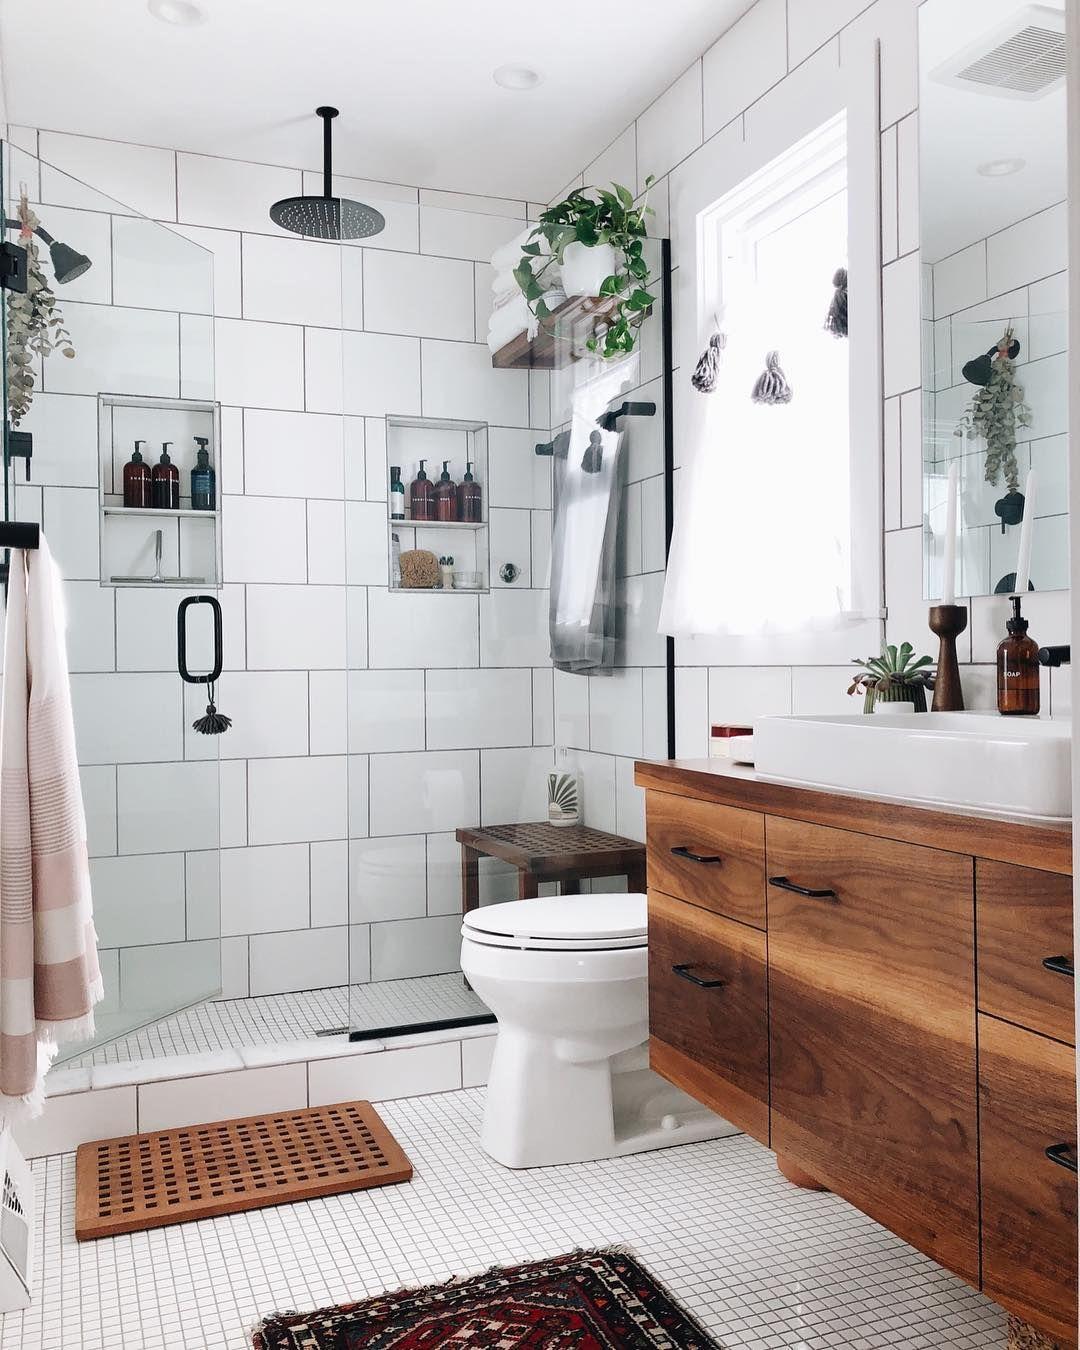 Bathroom Decor Ideas From Instagram